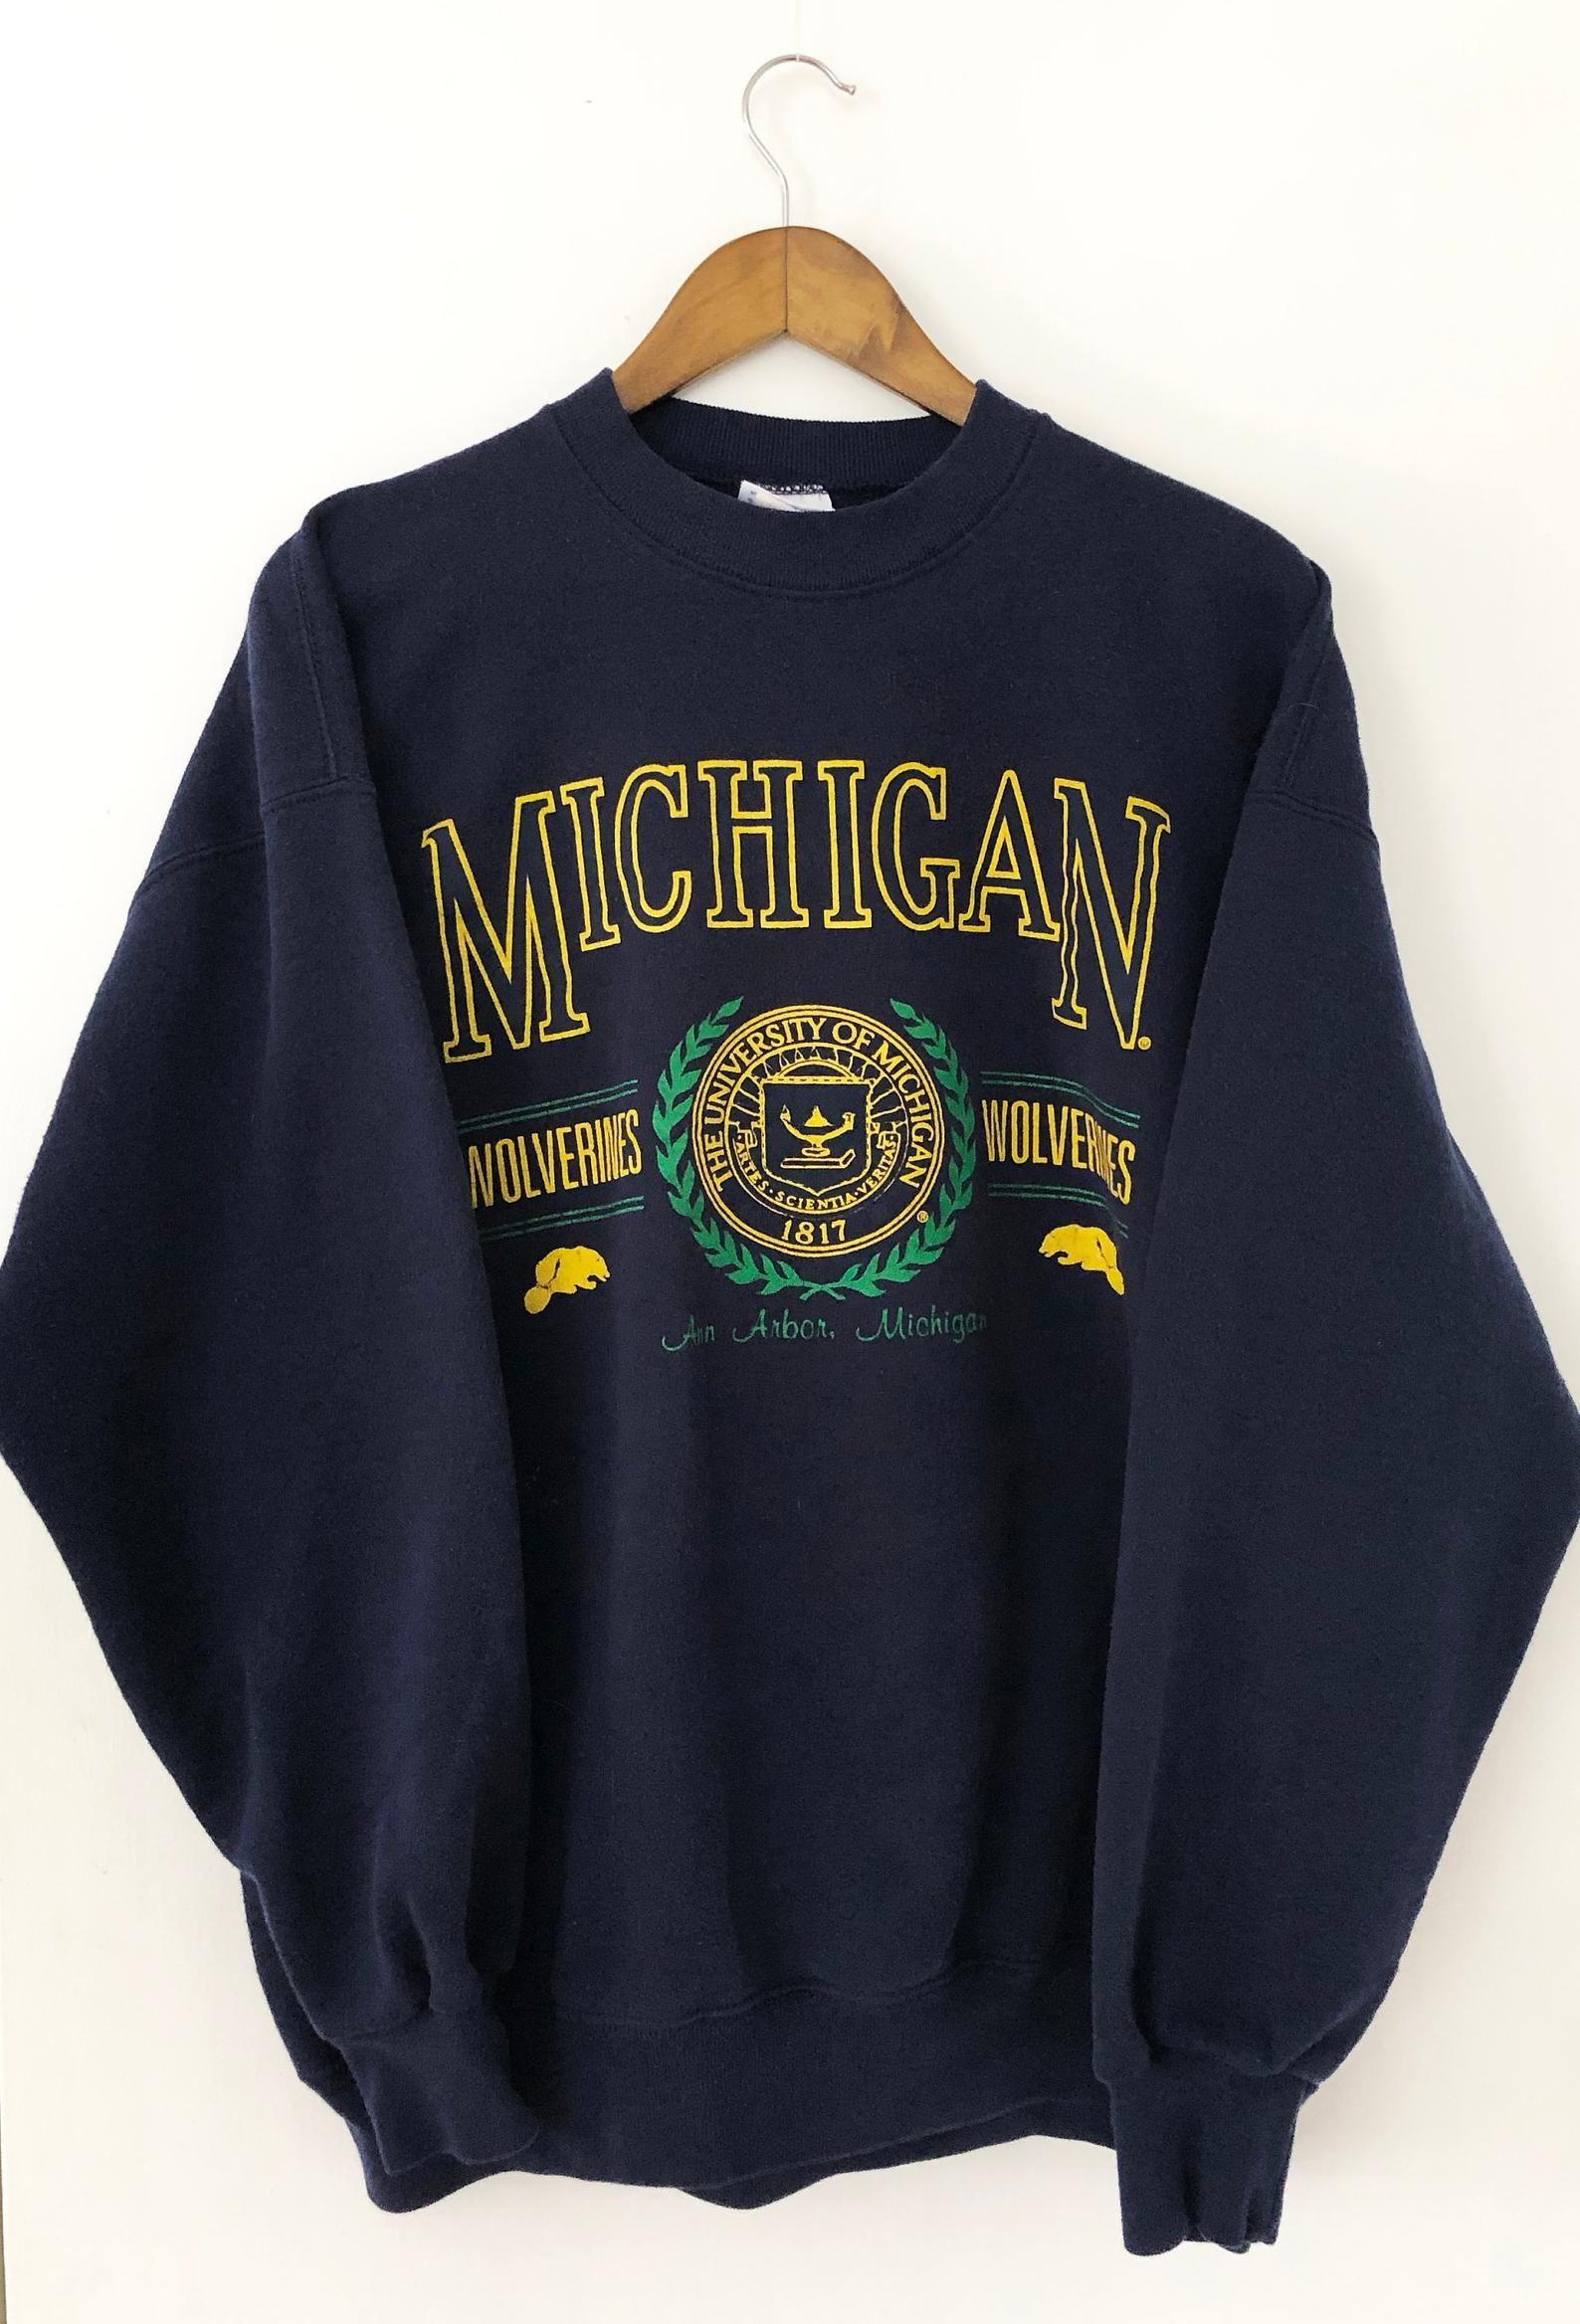 Vintage Navy Blue Ncaa University Of Michigan Wolverines Basketball Football Crewneck Pullover College Sports Sweatshirt Champion Xxl 2xl Vintage College Sweatshirts Sweatshirts College Crewneck Sweatshirts [ 2336 x 1588 Pixel ]